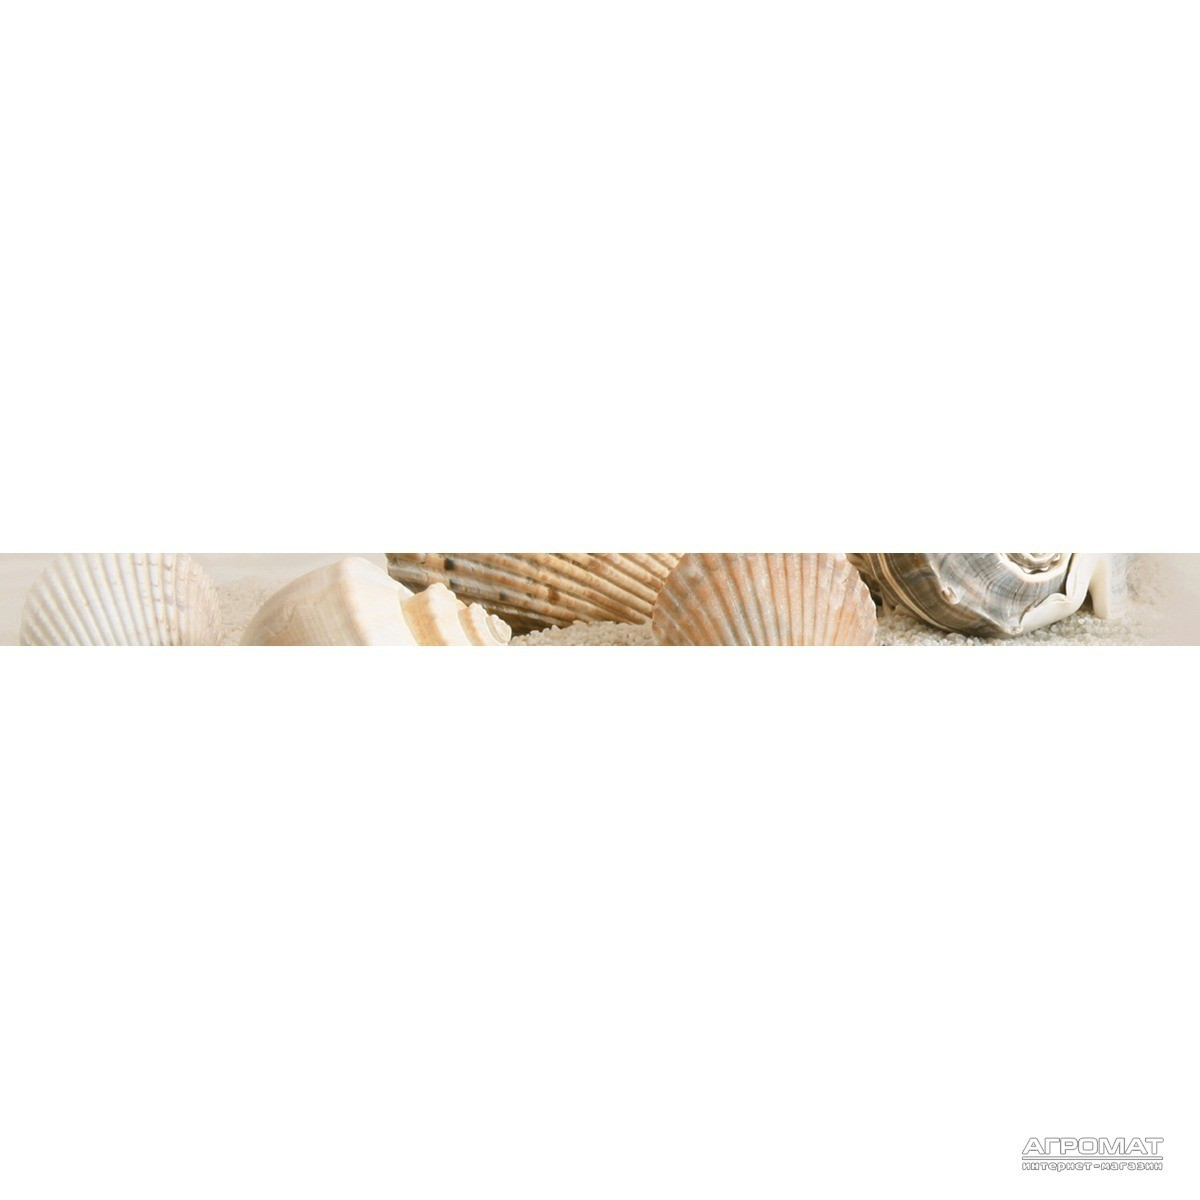 Плитка GOLDEN TILE Summer stone holiday SUMMER STONE БЕЖЕВЫЙ В41301 арт.(264821)